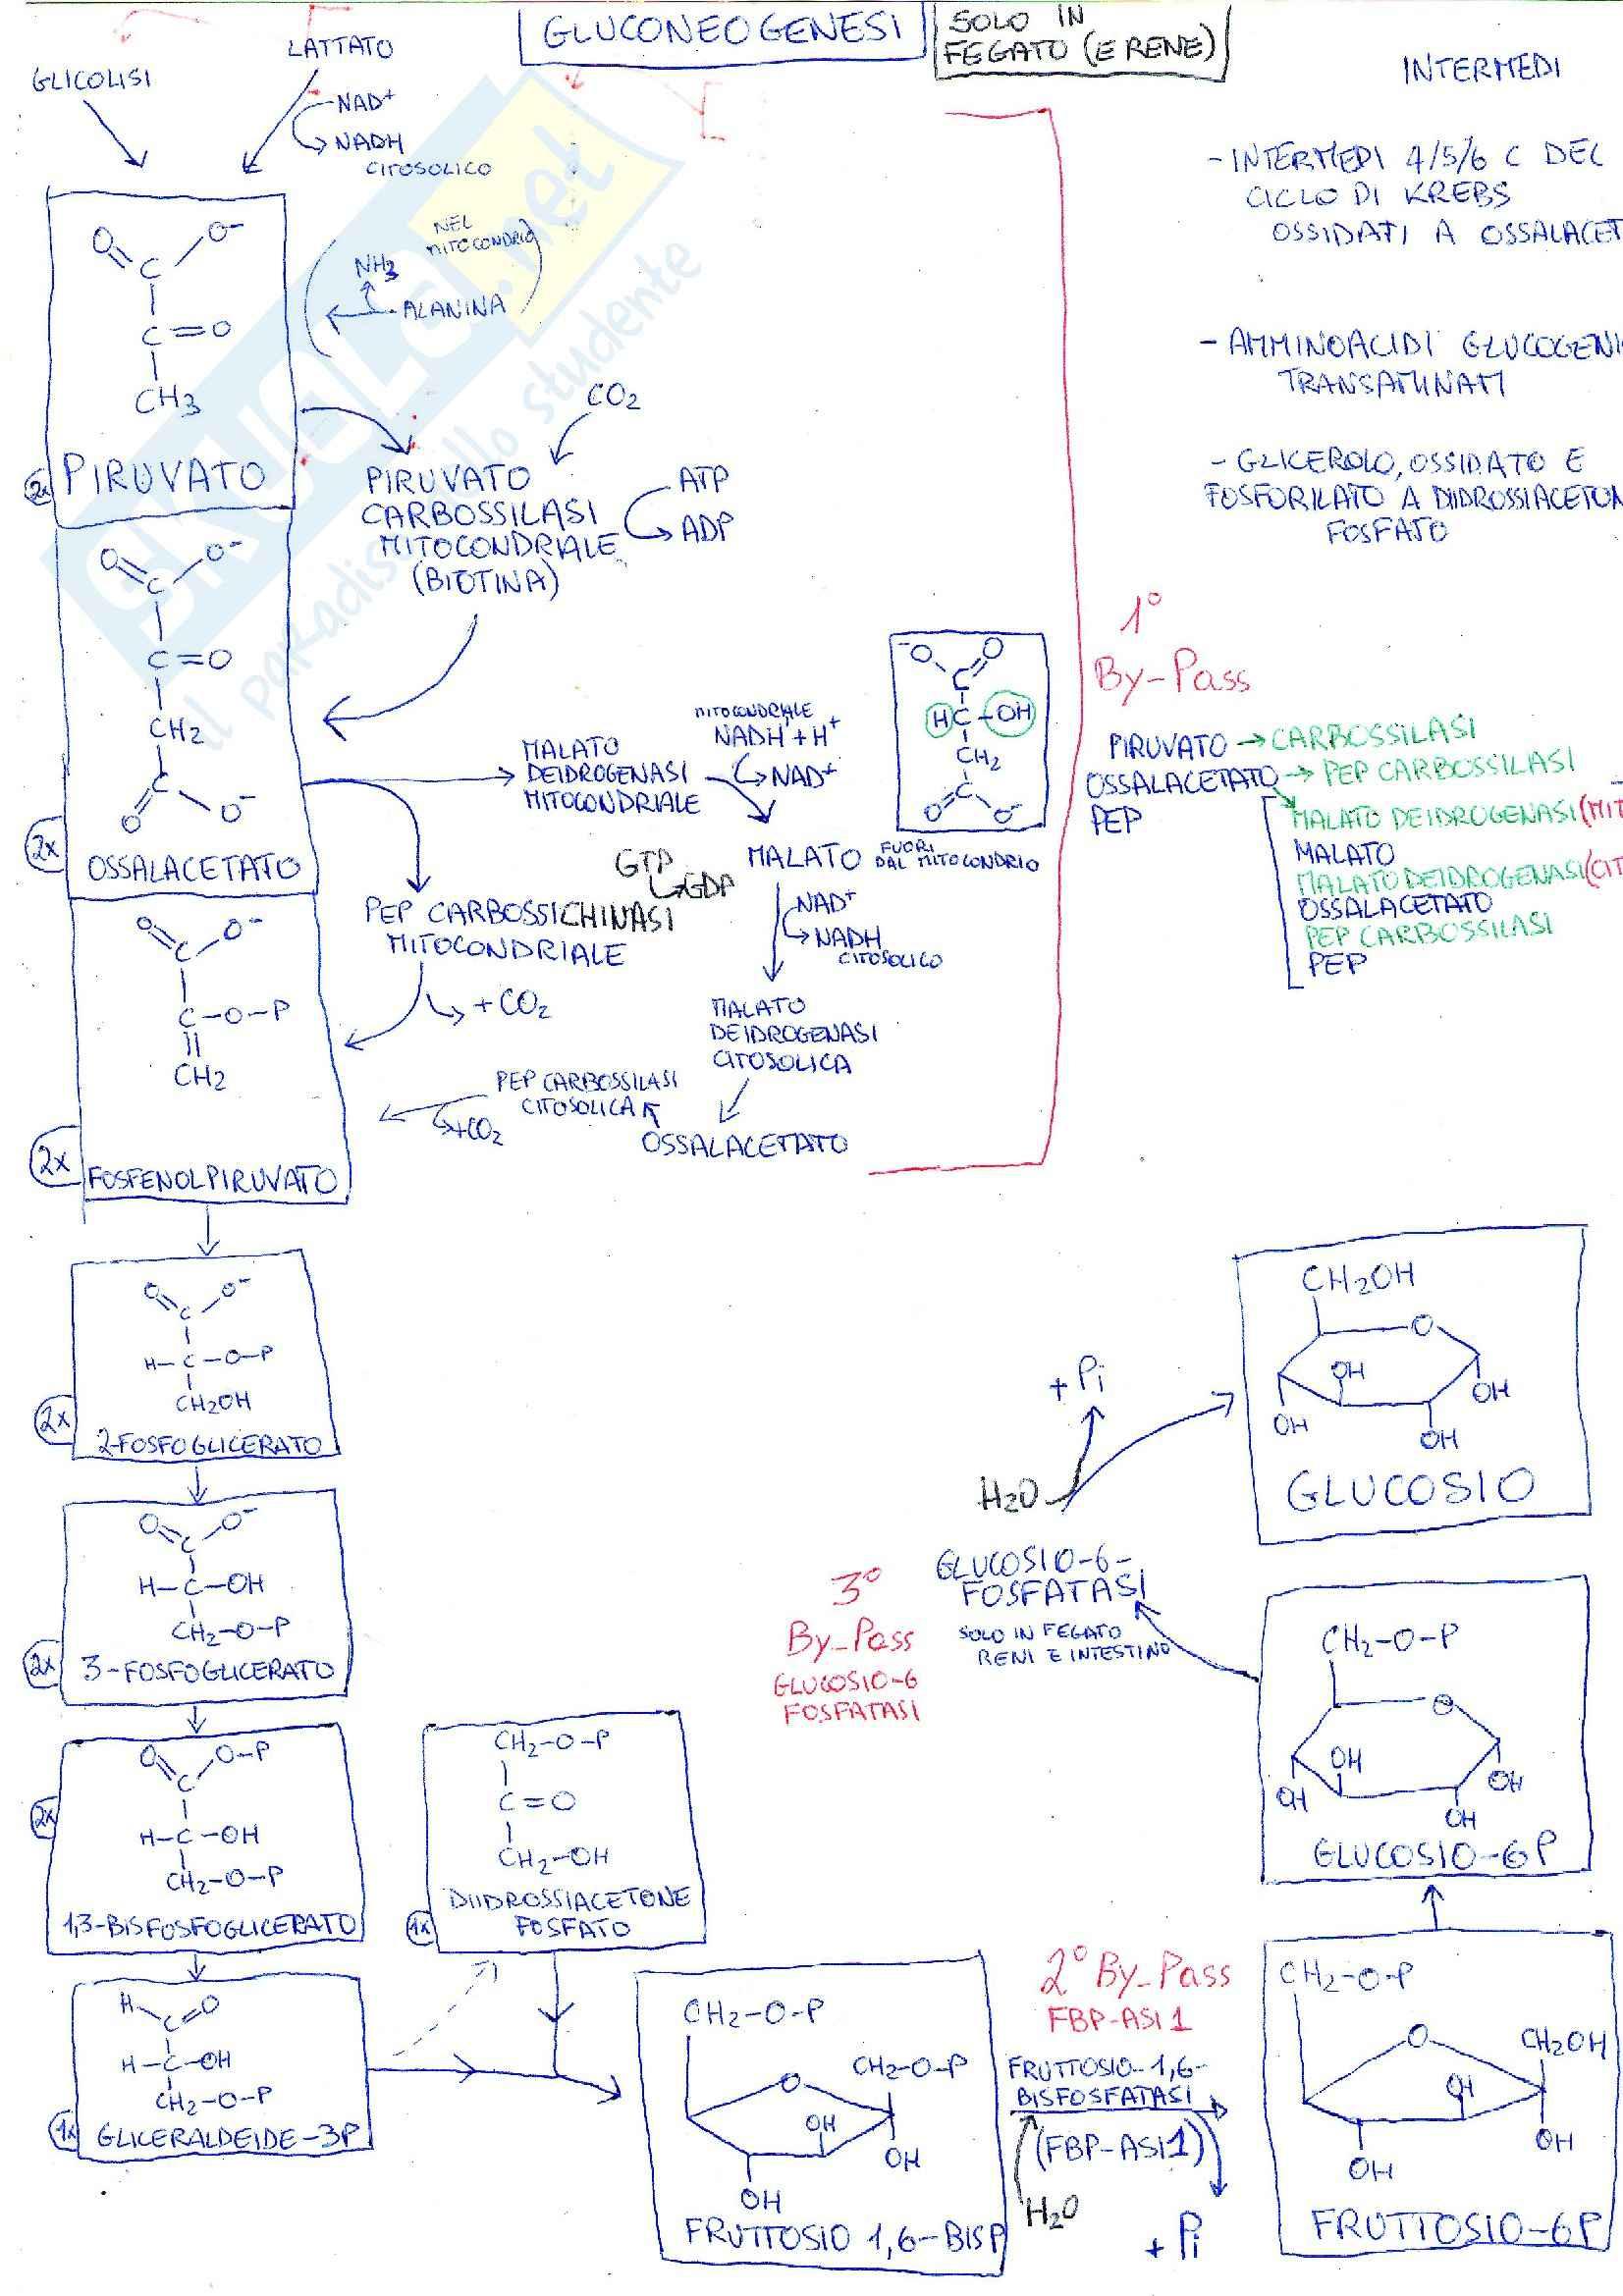 Riassunto esame Biochimica medica generale, prof. Chiarugi Pag. 36